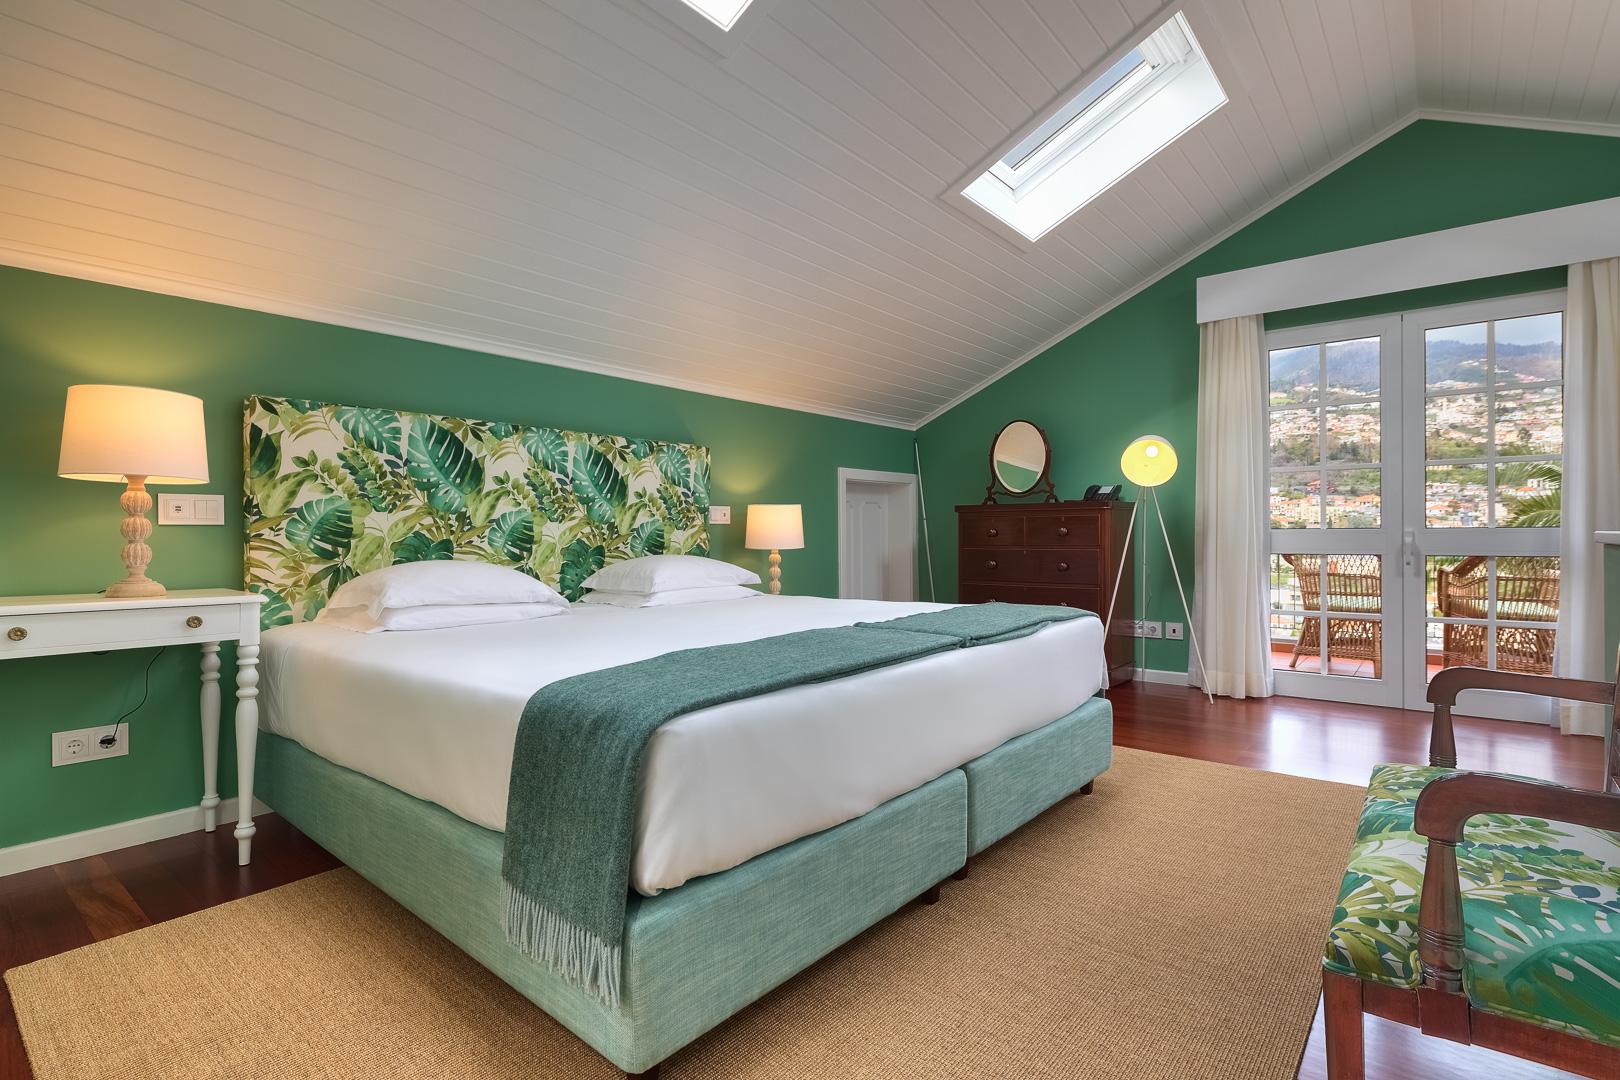 HOTEL_QUINTA_JARDINS_DO_LAGO_DIA_2_15022018_MG_7189_1114.jpg